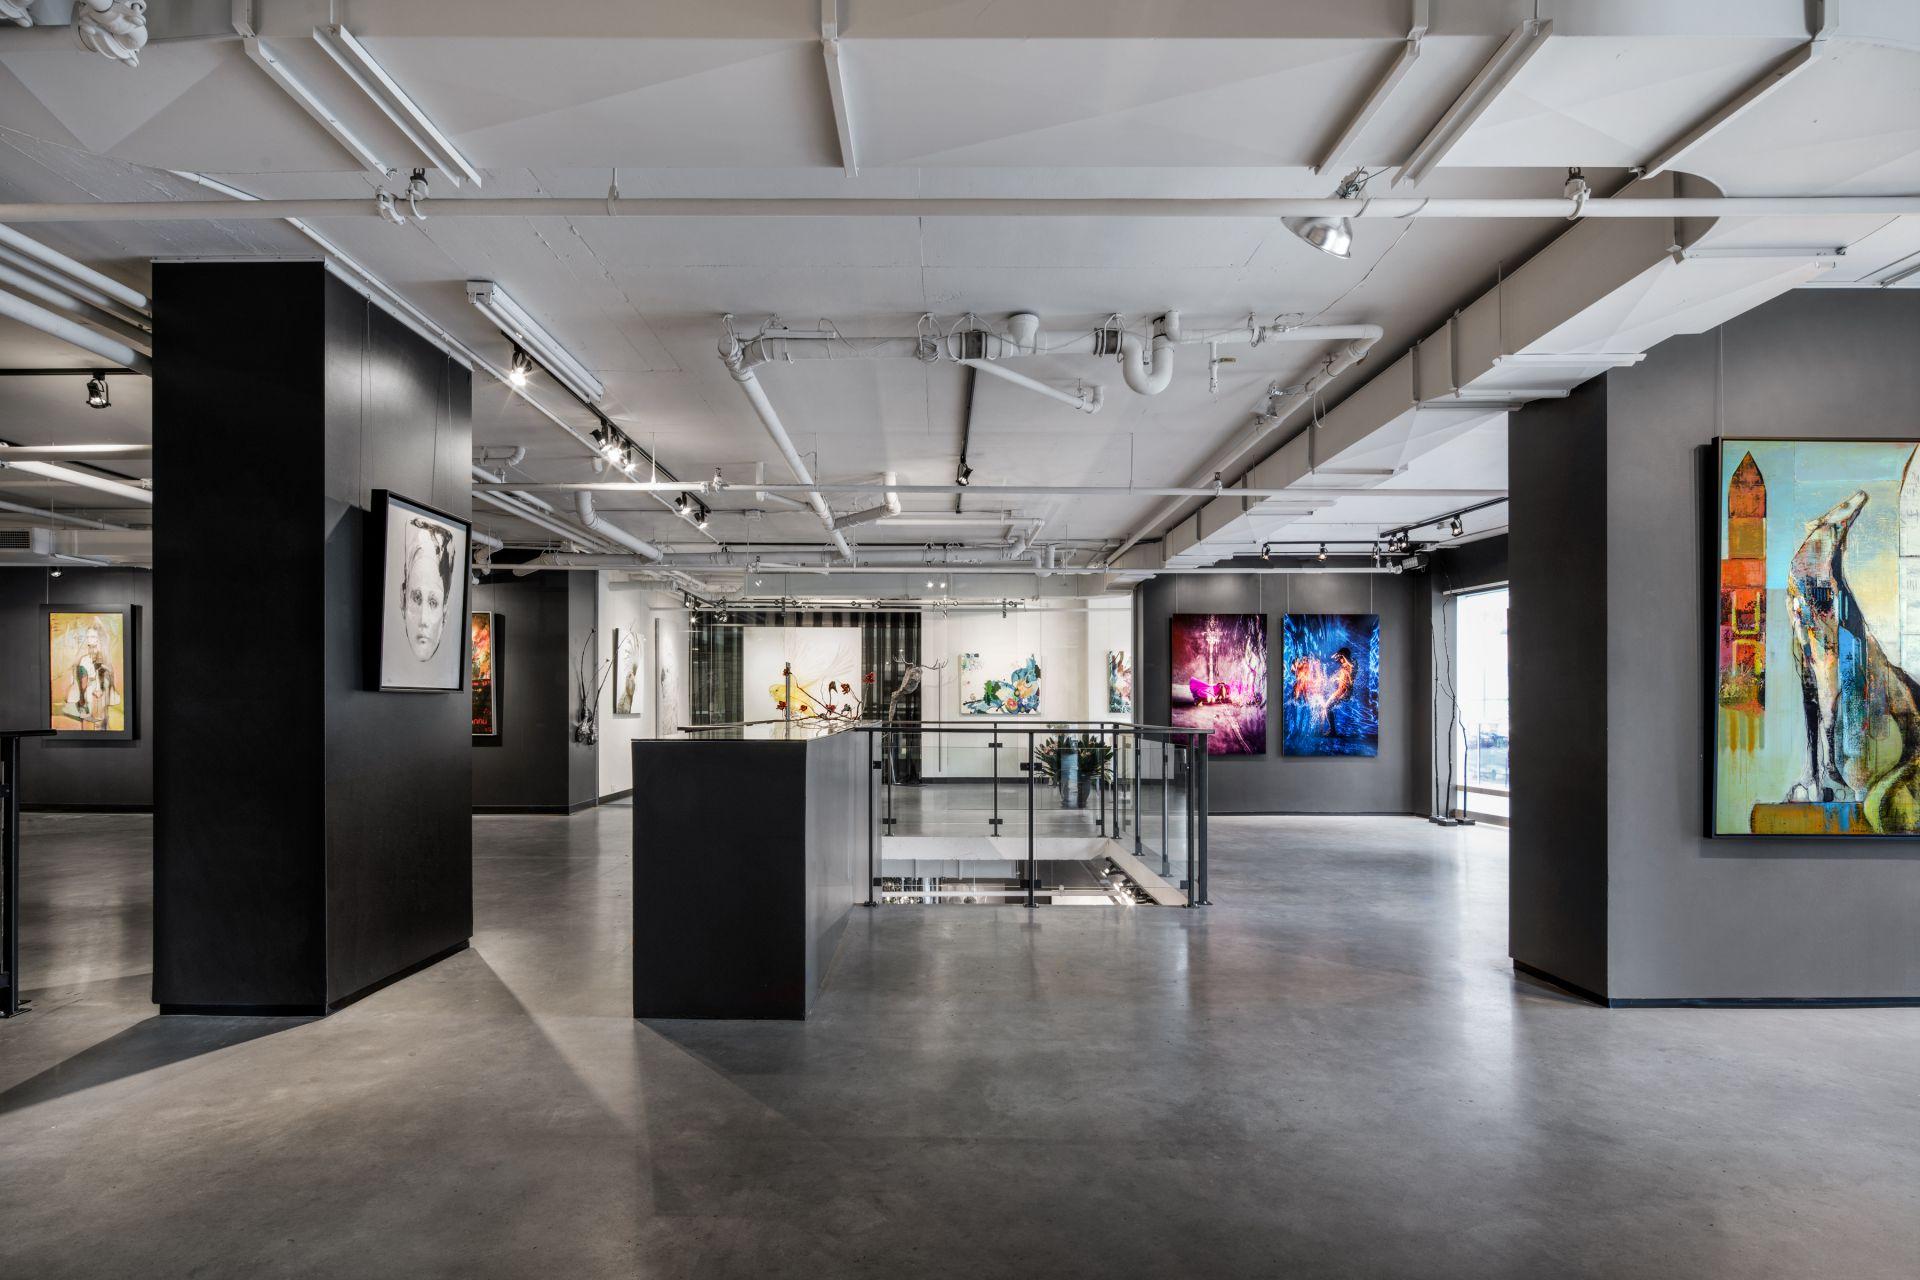 ALSQ  Galerie MX  Galerie dart MX  2  Montral  Montral VilleMarie